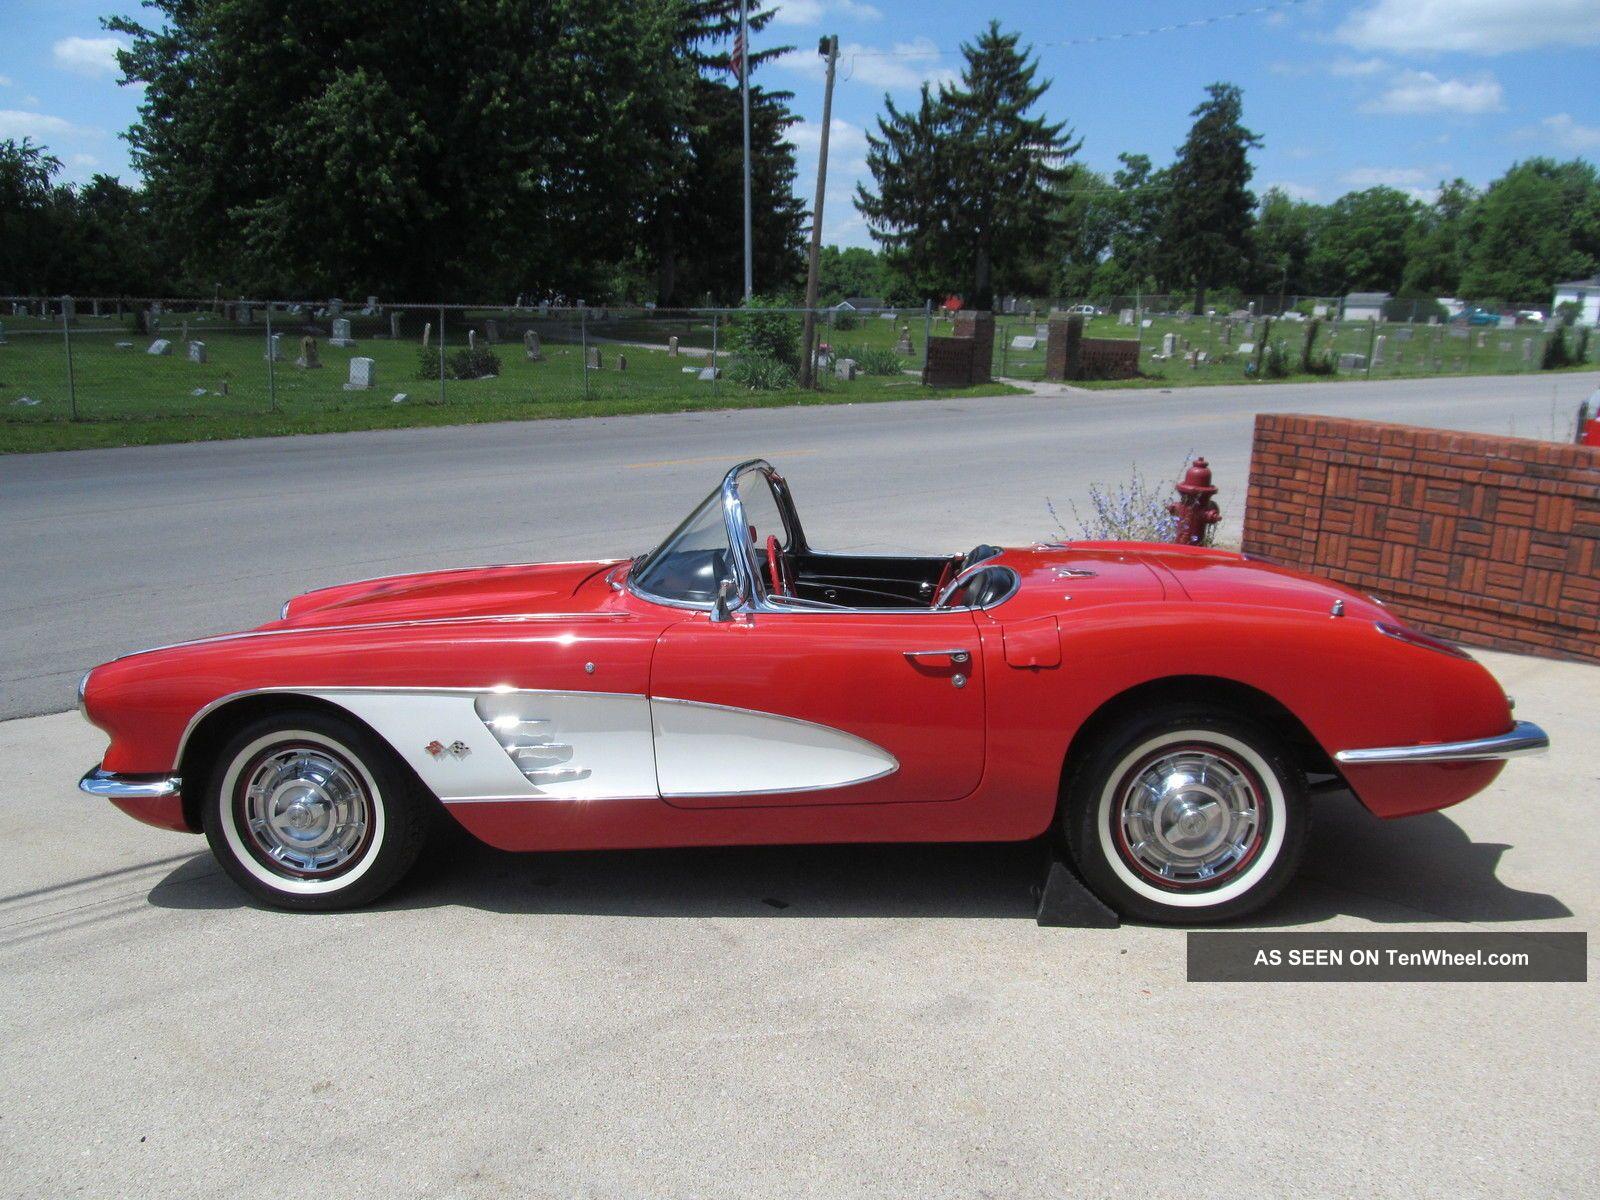 1959 Chevrolet Corvette Base Convertible